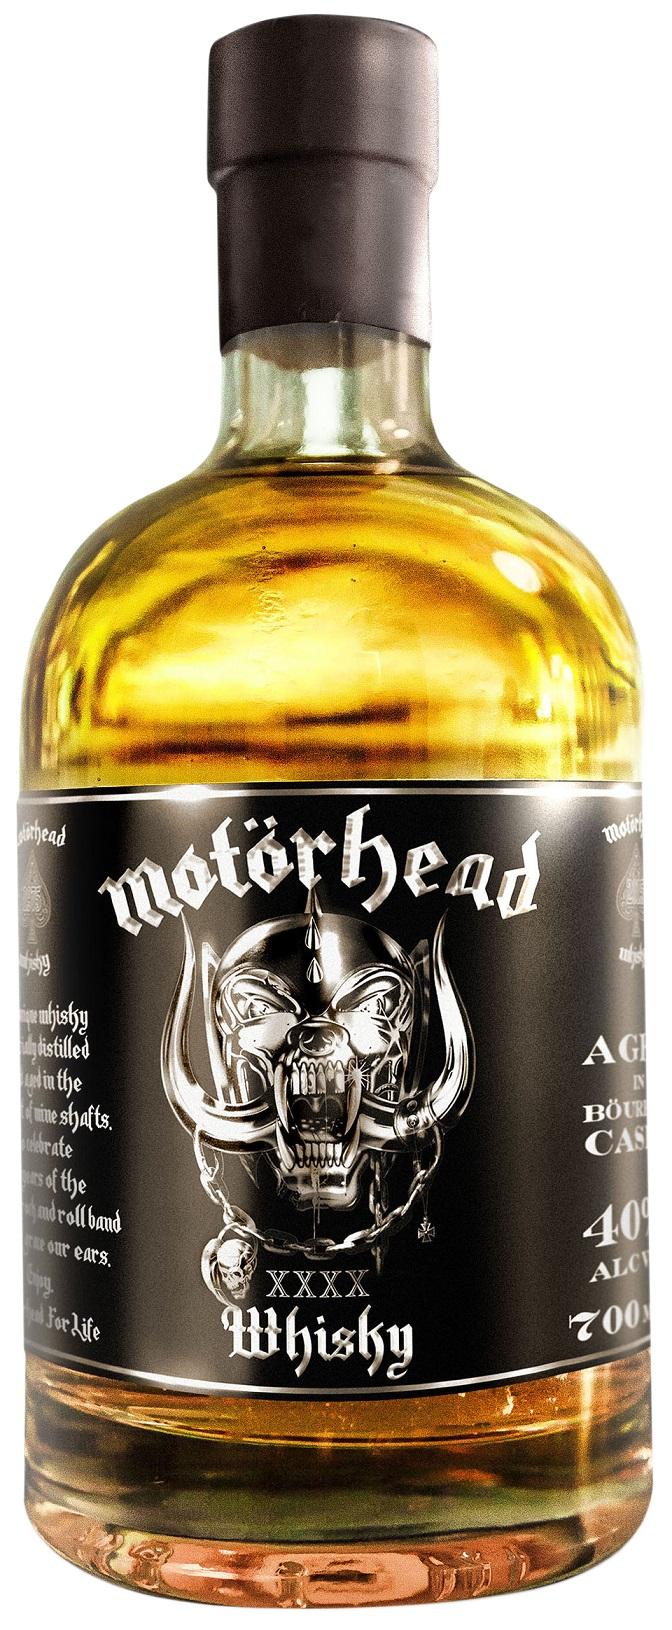 Motörhead Single Malt Whisky